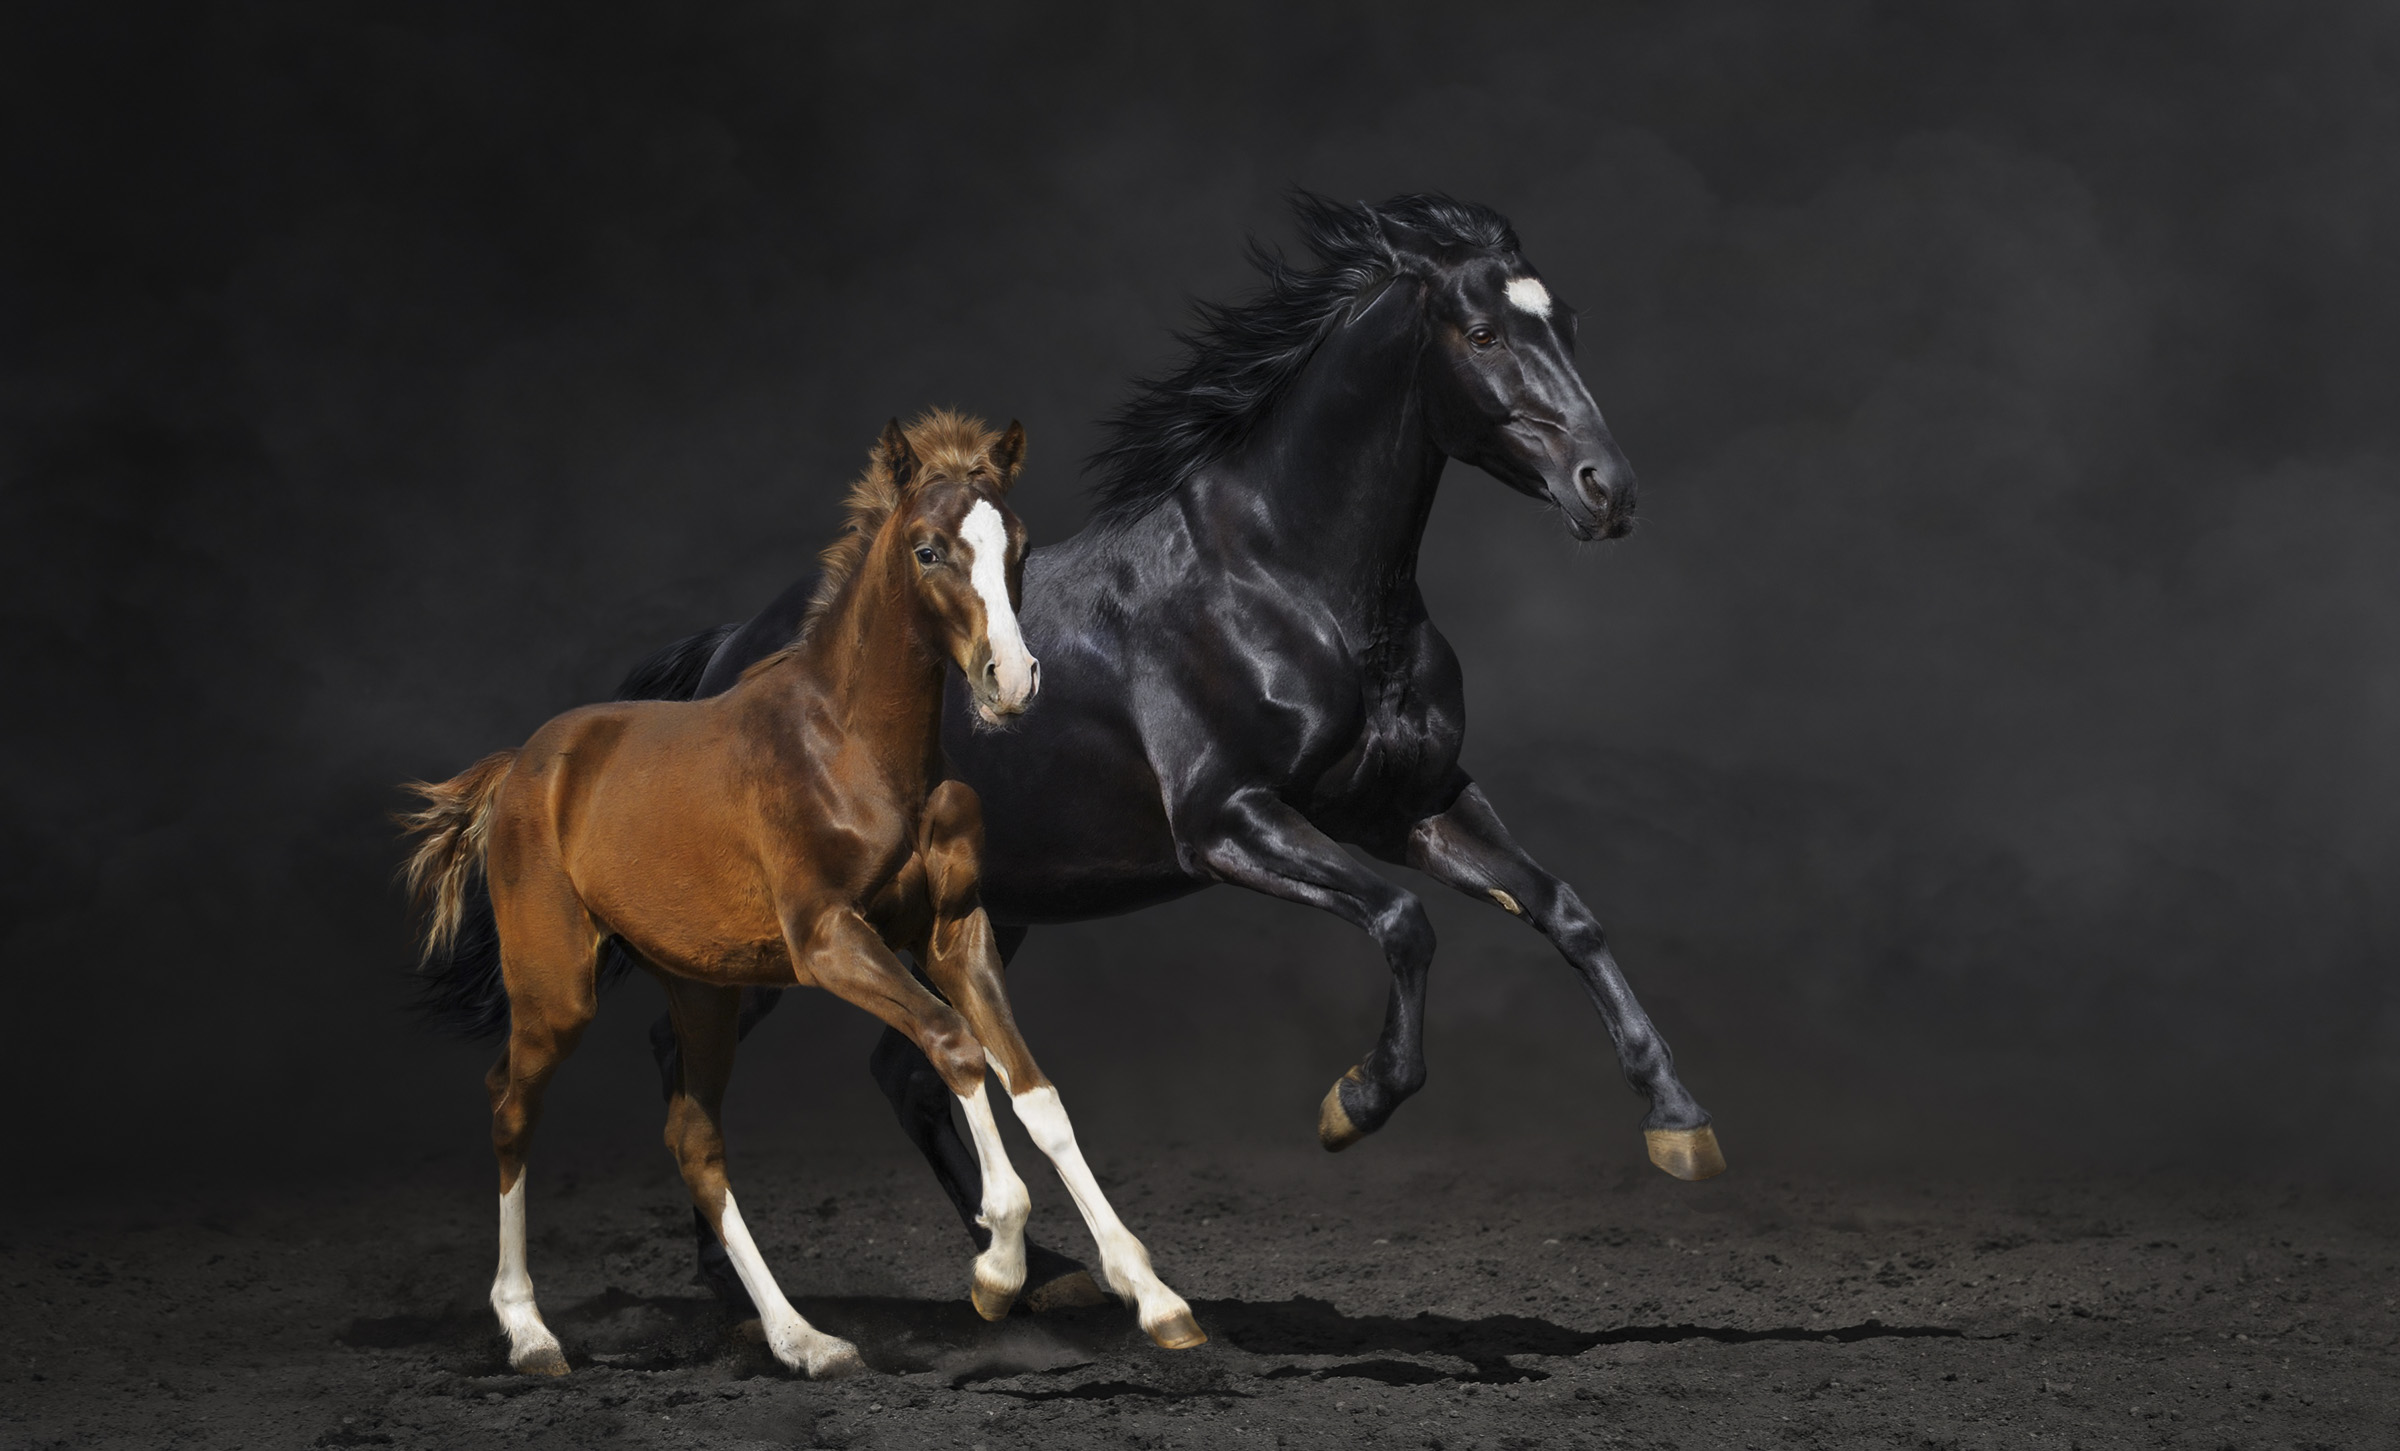 Pferdefotografie im Studio